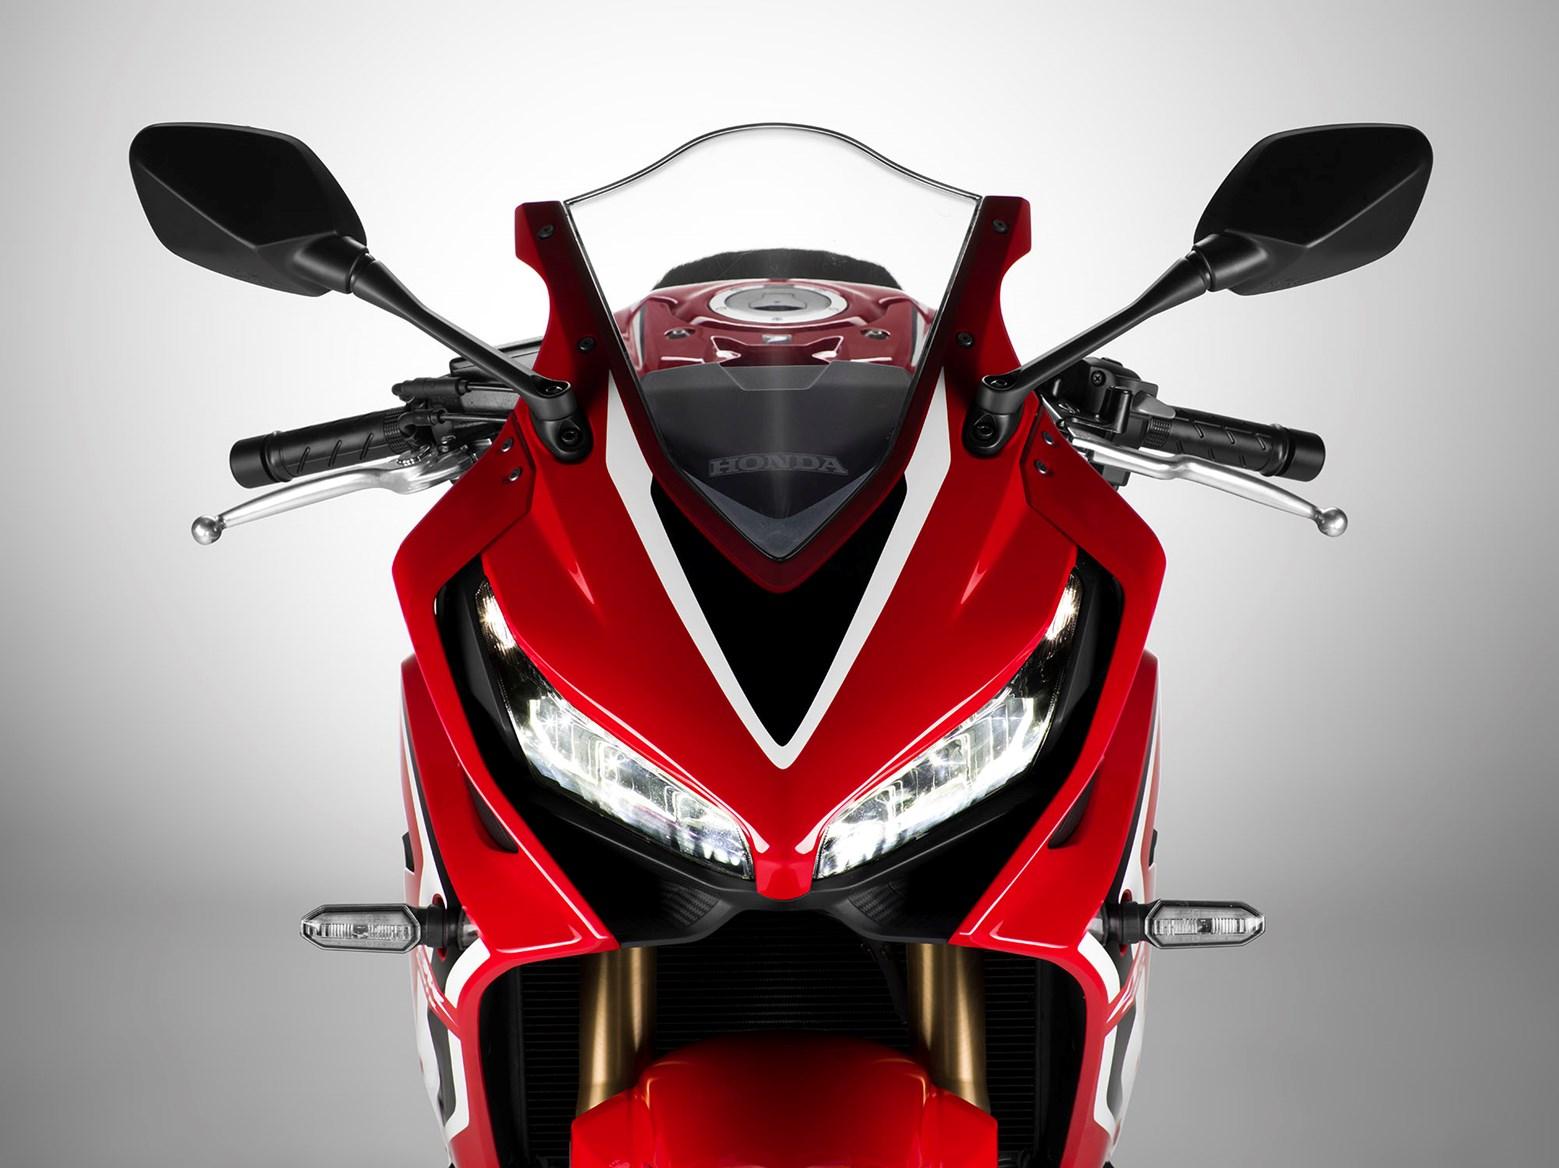 2019 Honda Cbr650r Introduced At Eicma 2018 Bikesrepublic